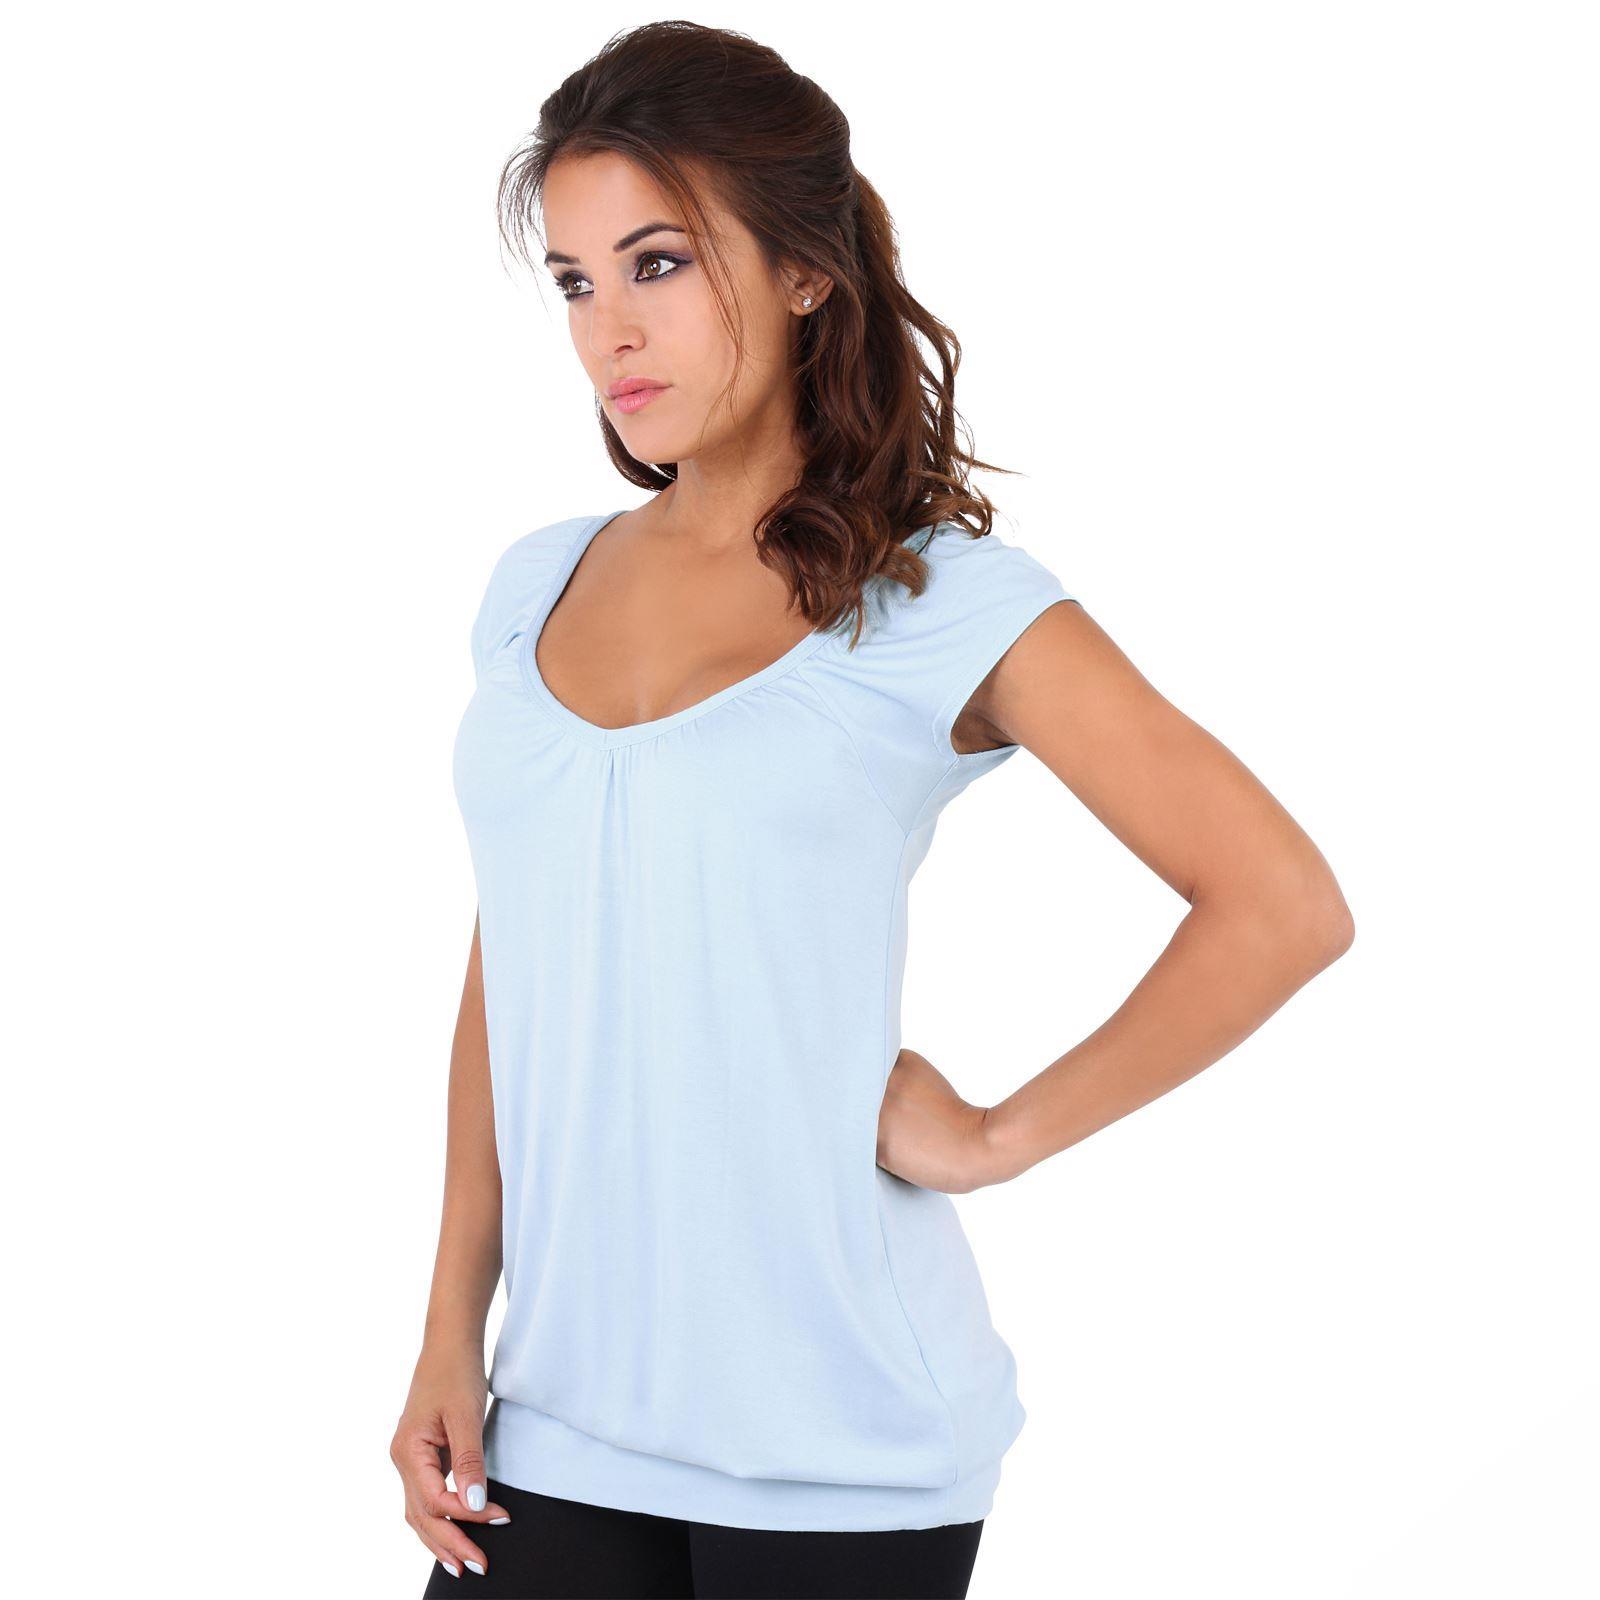 Womens-Ladies-Scoop-Neck-Blouse-V-T-Shirt-Long-Short-Sleeve-Plain-Loose-Top thumbnail 4